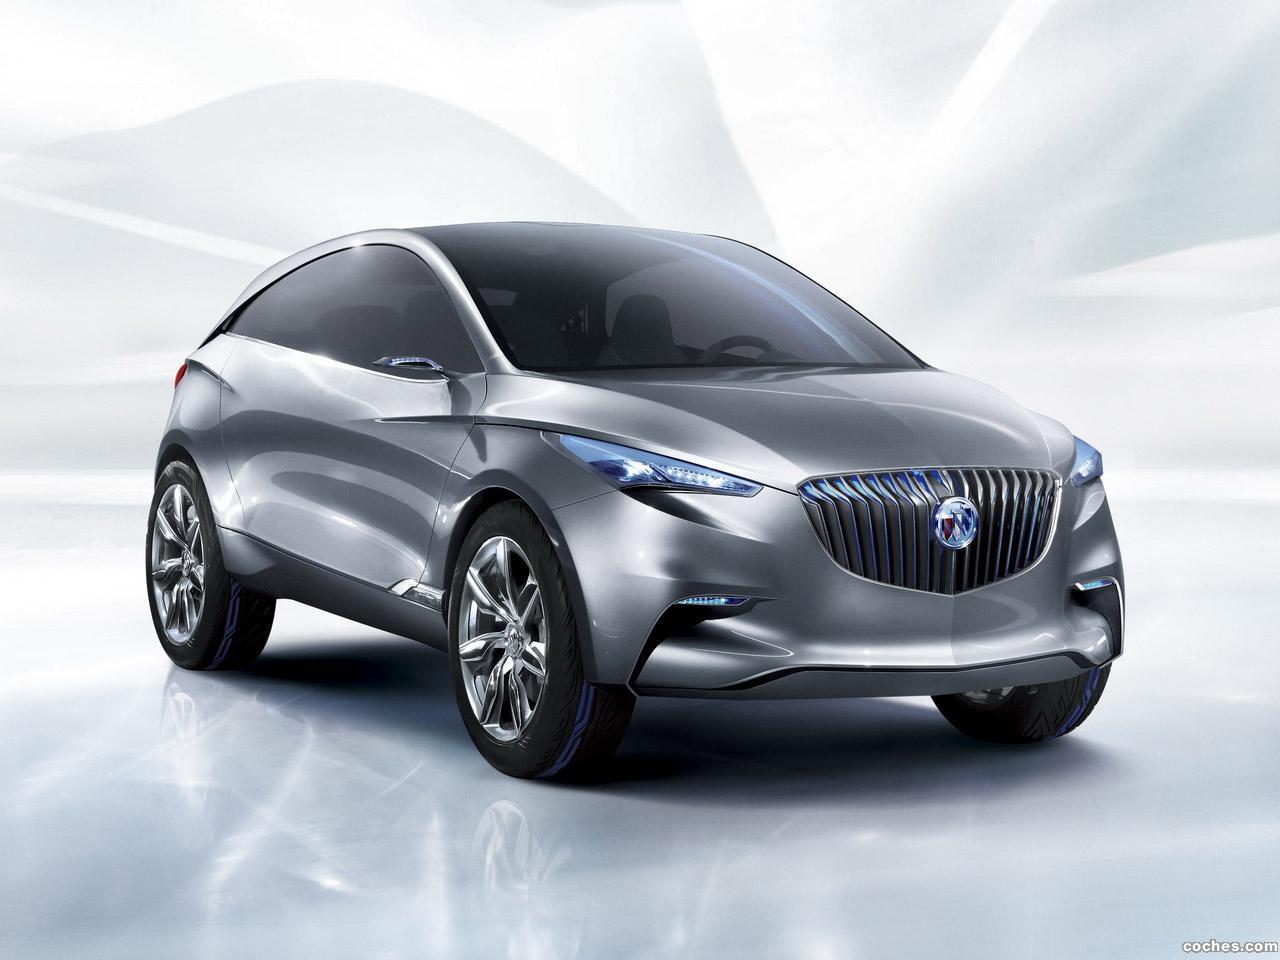 Foto 0 de Buick Envision SUV Concept 2011